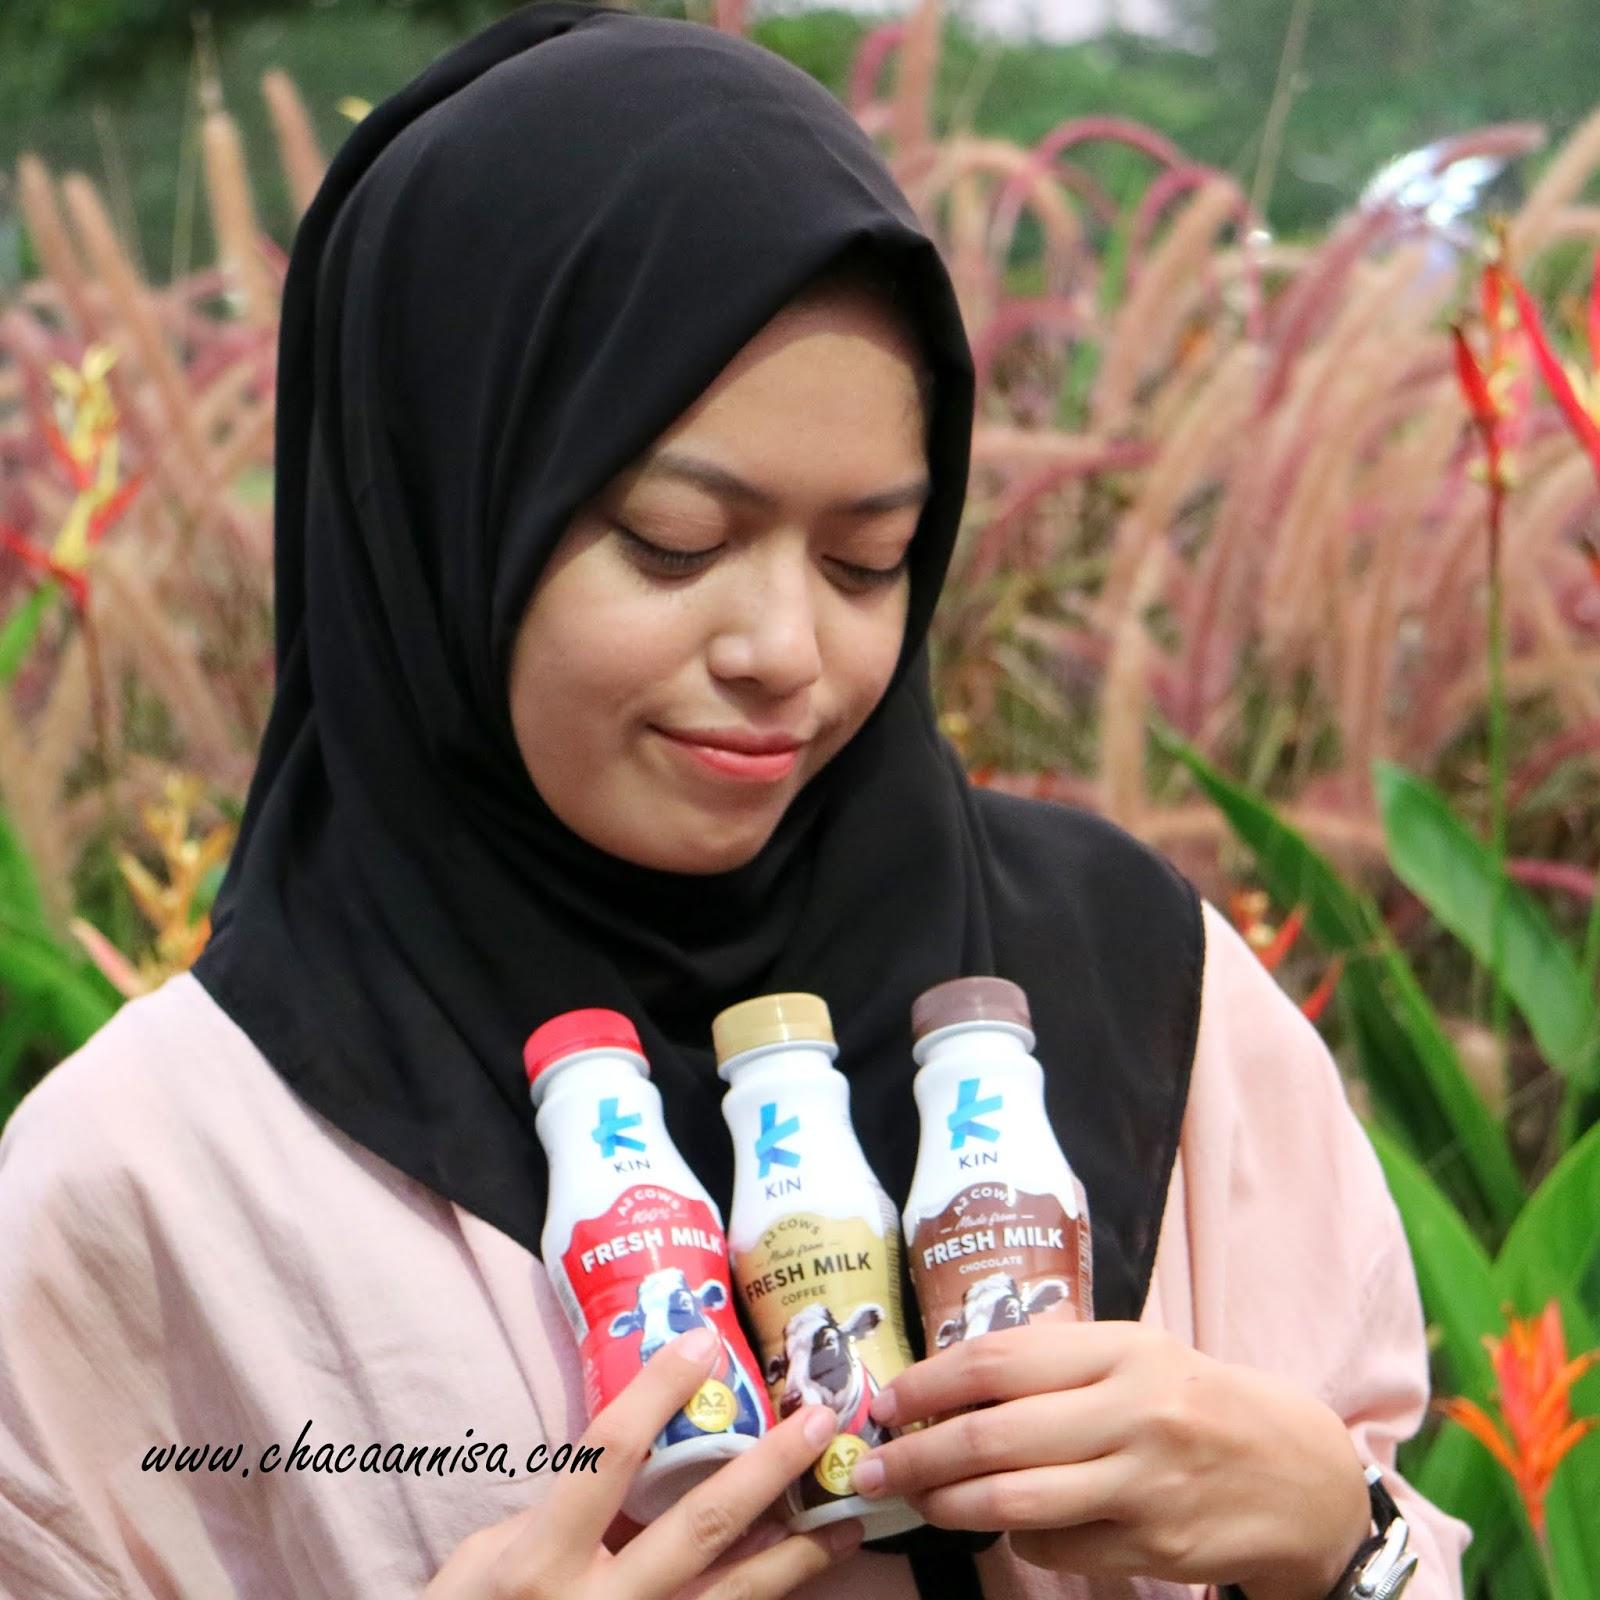 Chaca Annisa H Ovale Micellar Water Acne Skin 200ml Khusus Area Pulau Jawa Packaging Dari Kin Fresh Milk Ini Terbuat Botol Plastik Namun Walaupun Kemasannya Cukup Kokoh Dan Tidak Cepat Penyok